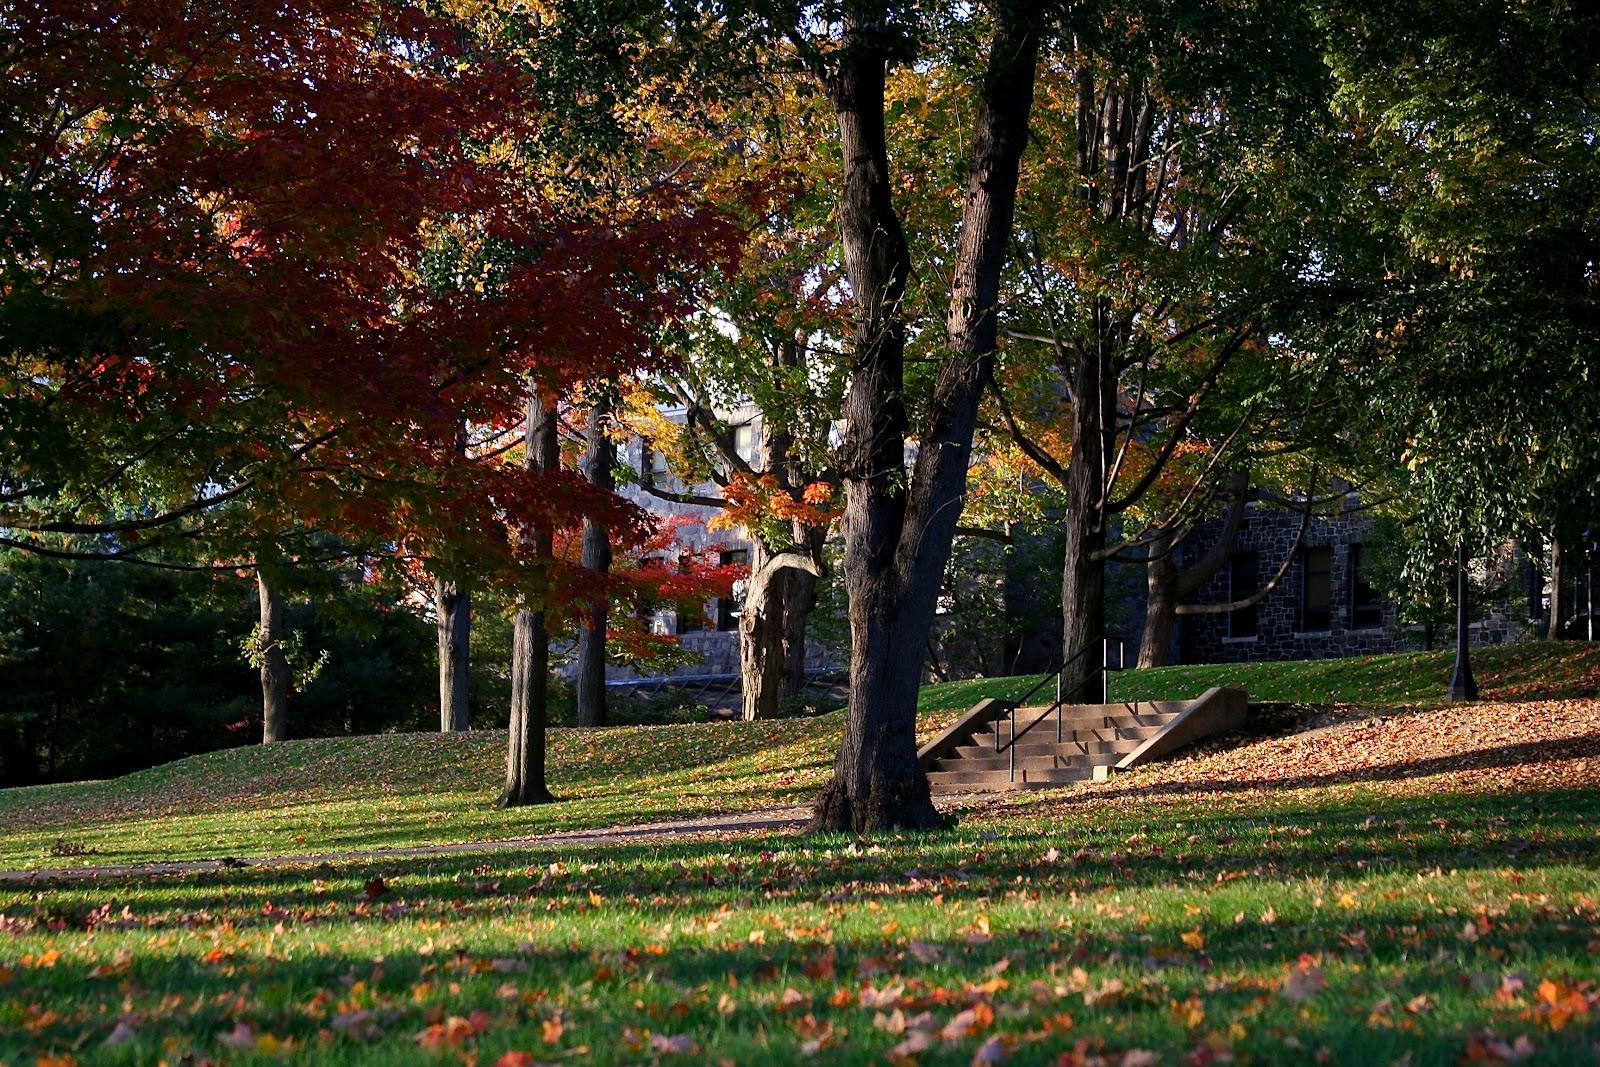 https://upload.wikimedia.org/wikipedia/commons/7/7e/Tufts_University_-_Garden%2C_presidents_lawn.jpg